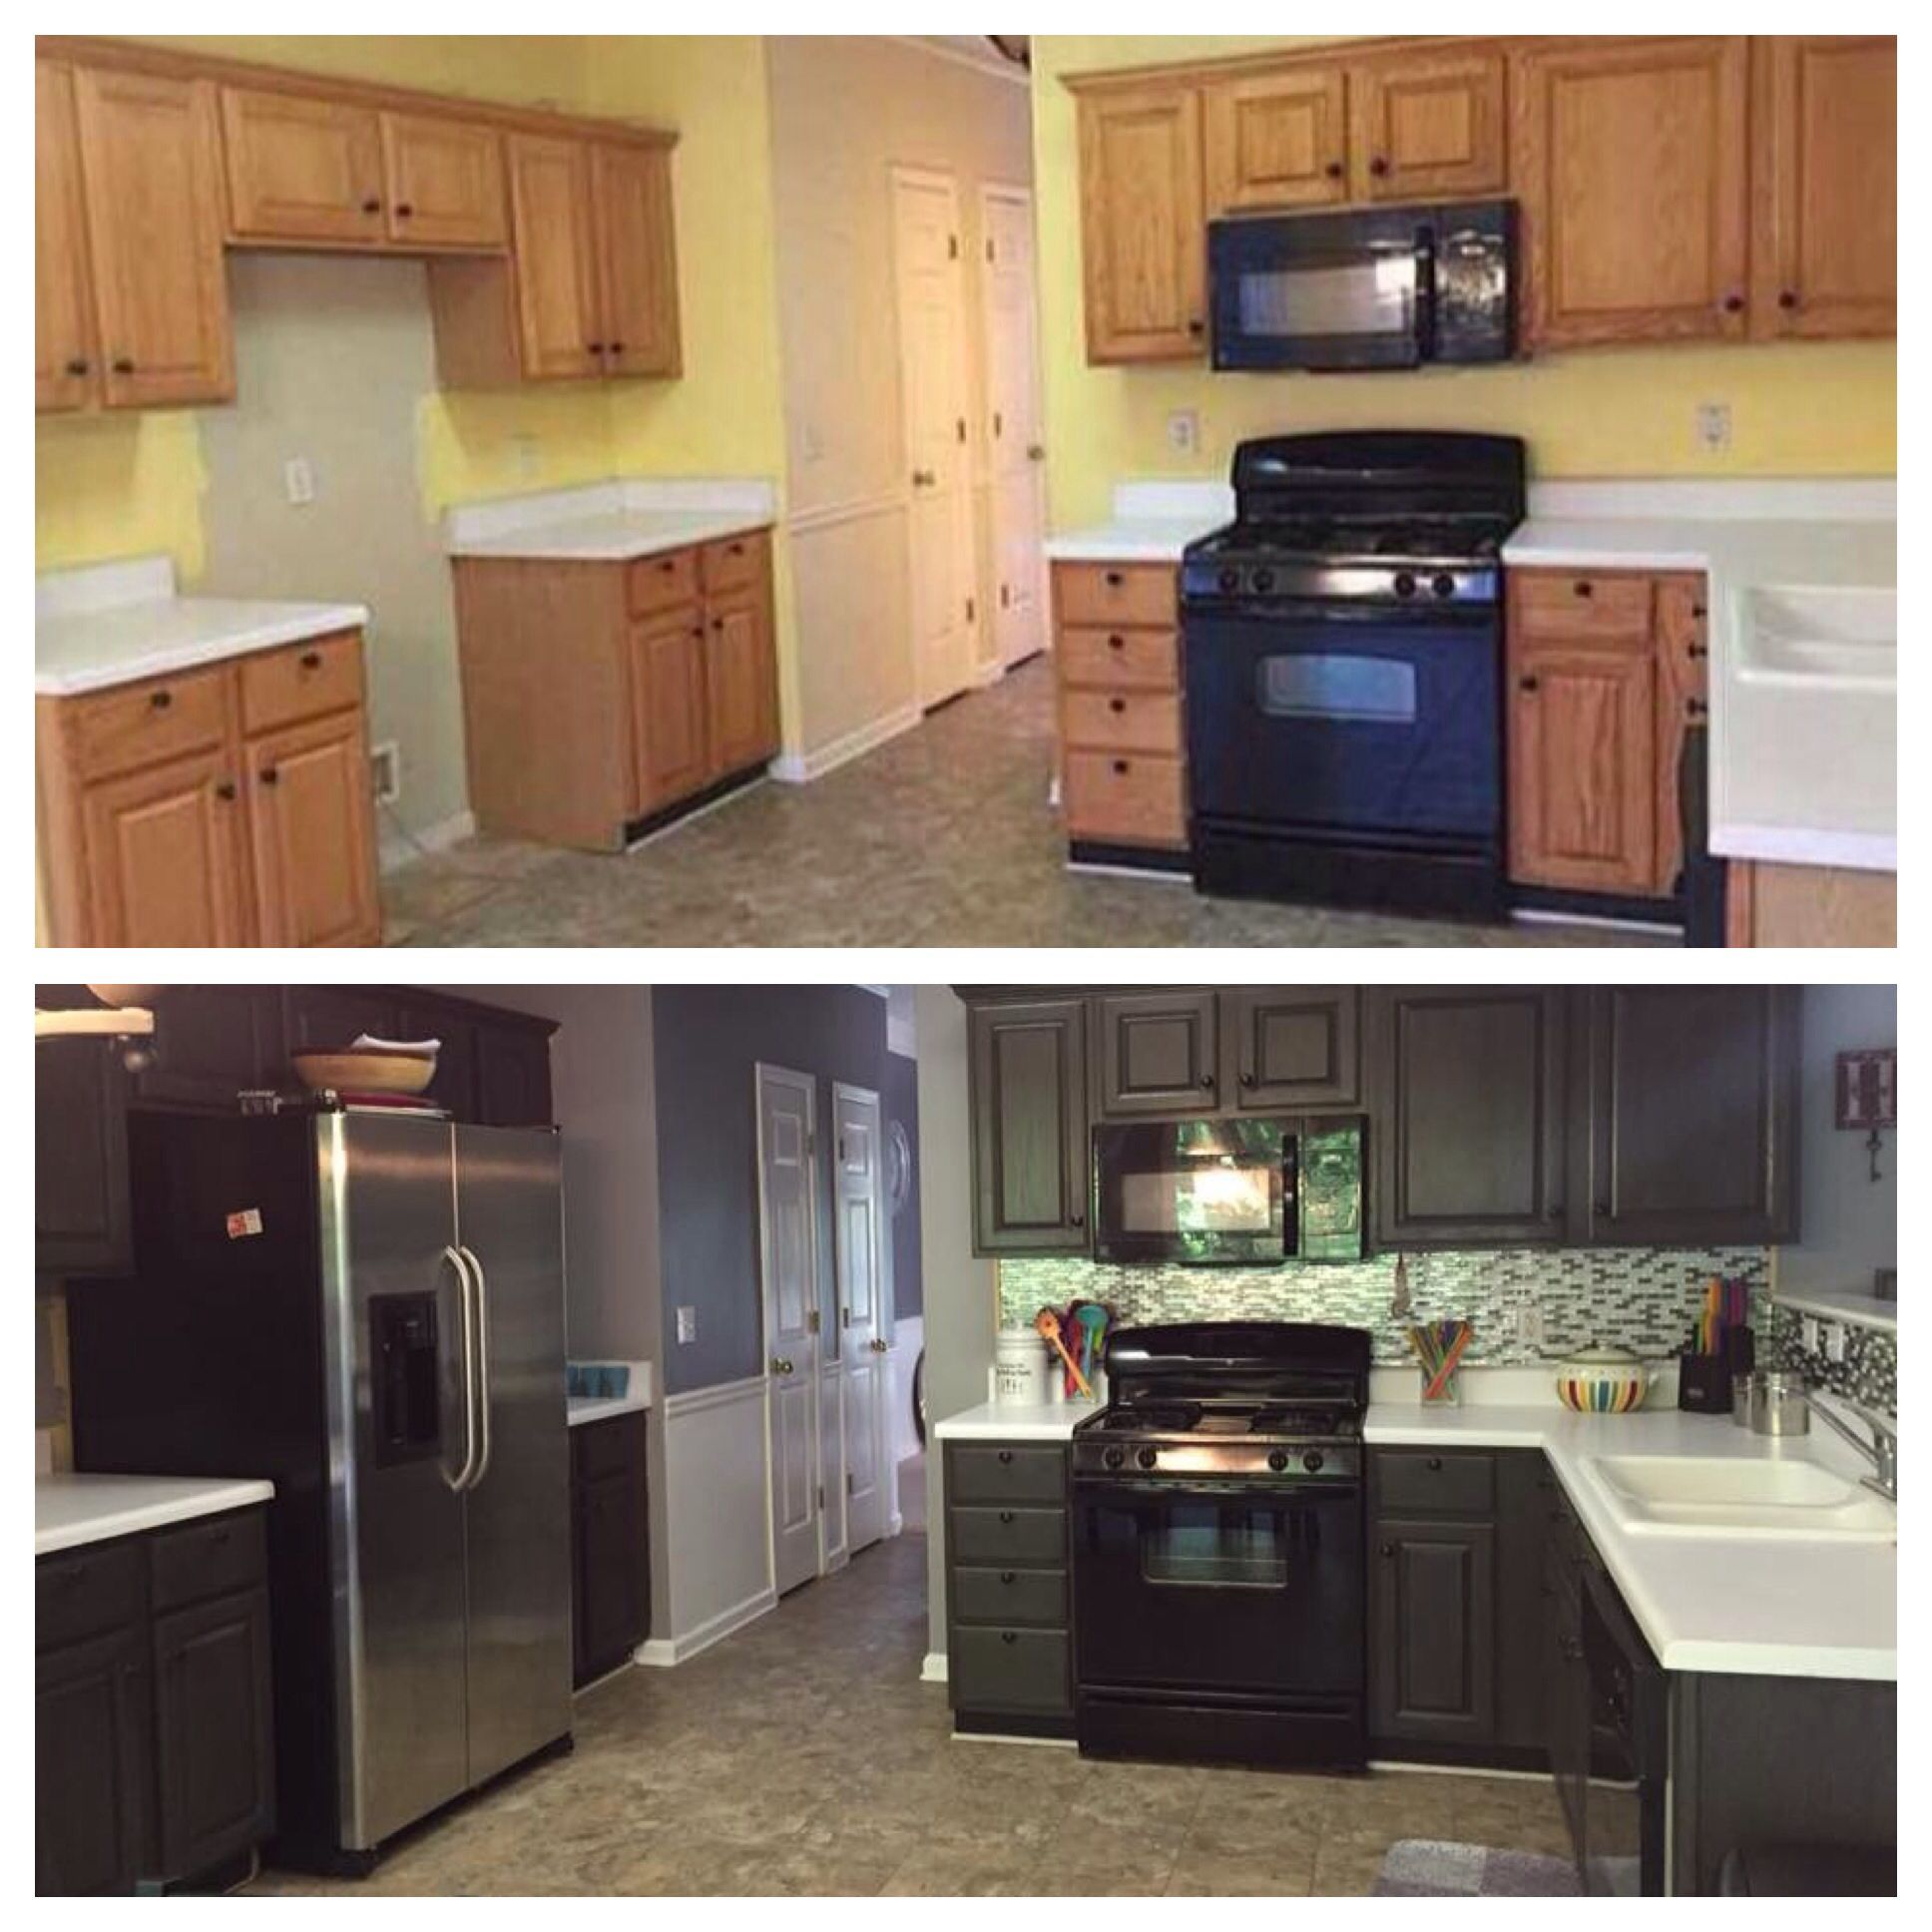 Kitchen Cabinets Look Like Furniture: Rethunk Junk Furniture Paint Is Awesome On Cabinets. Look